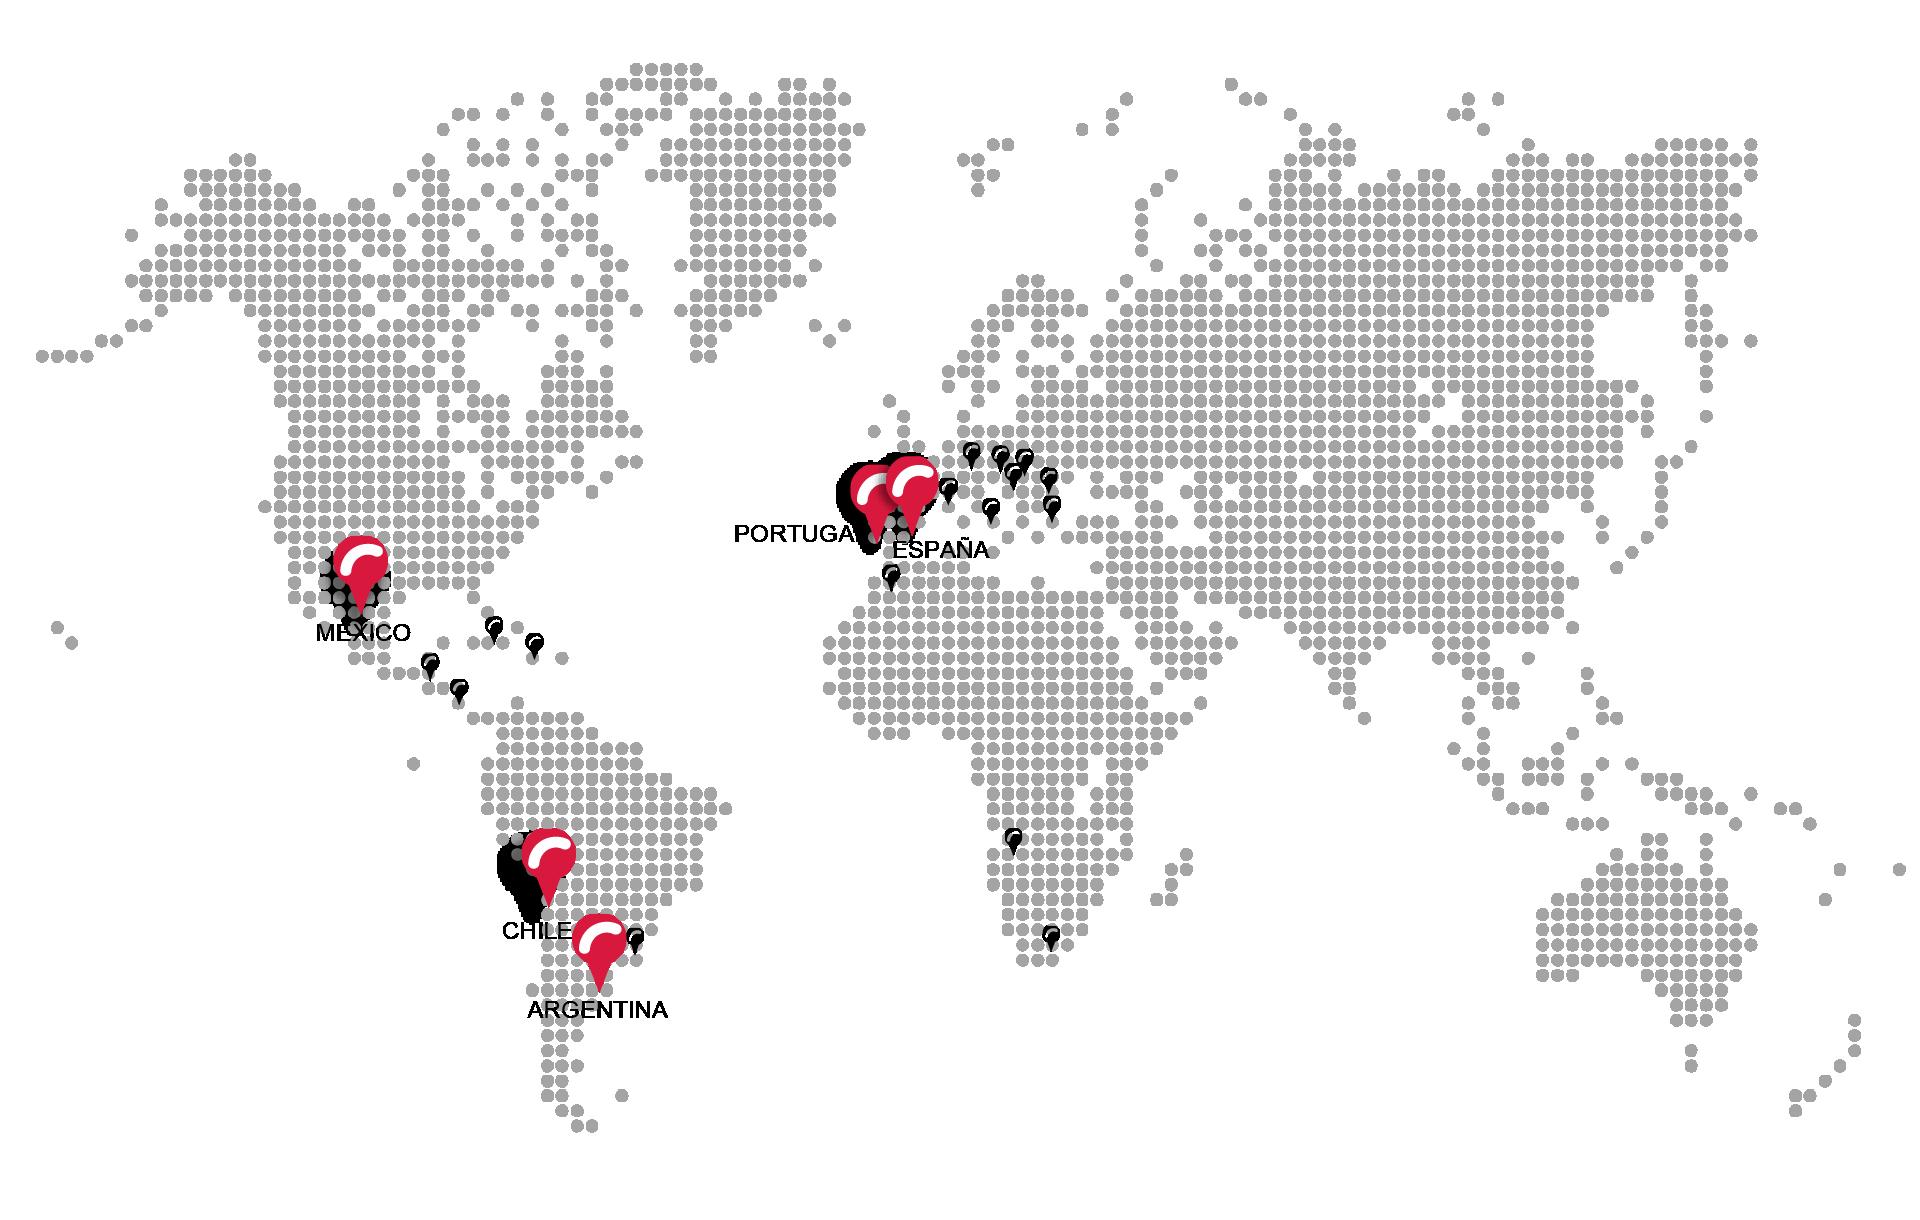 mapa mundi delegaciones